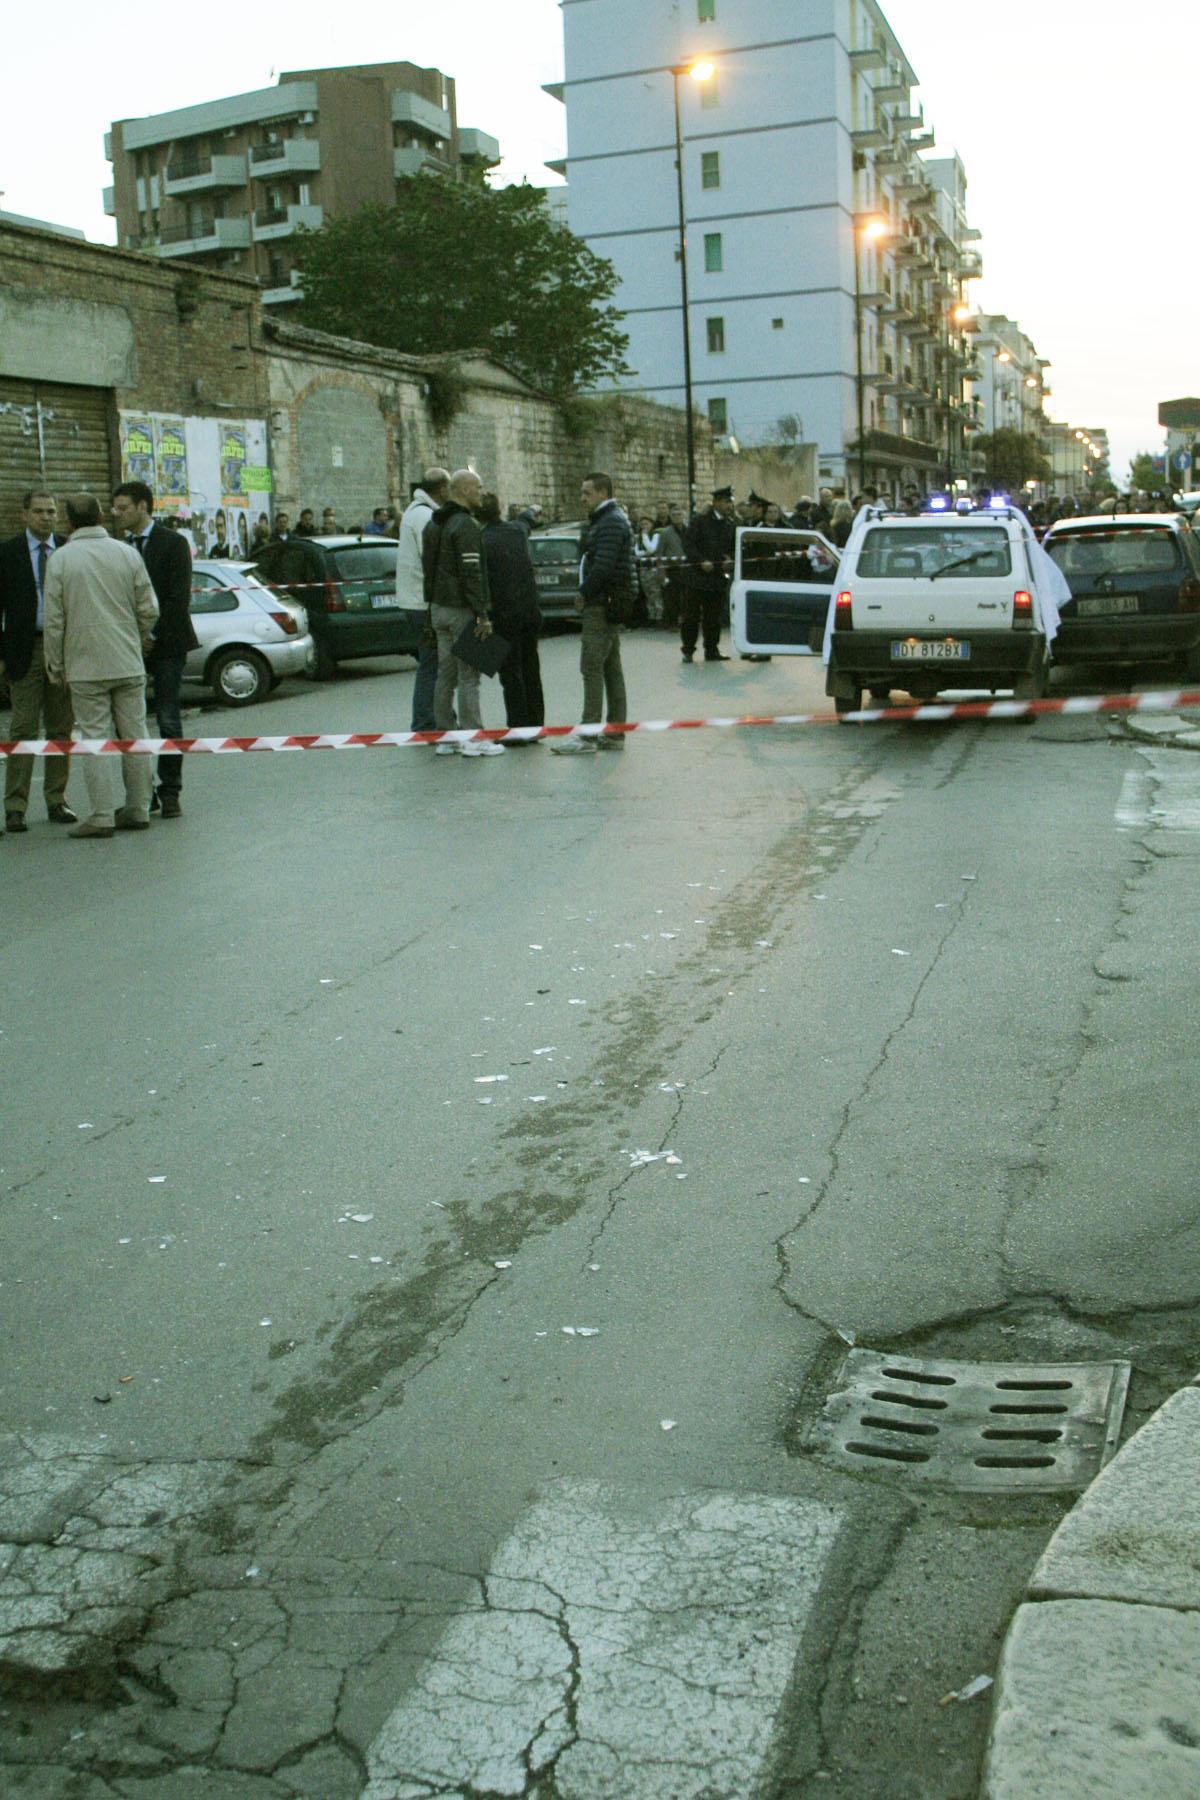 Omicidio in via lucera4